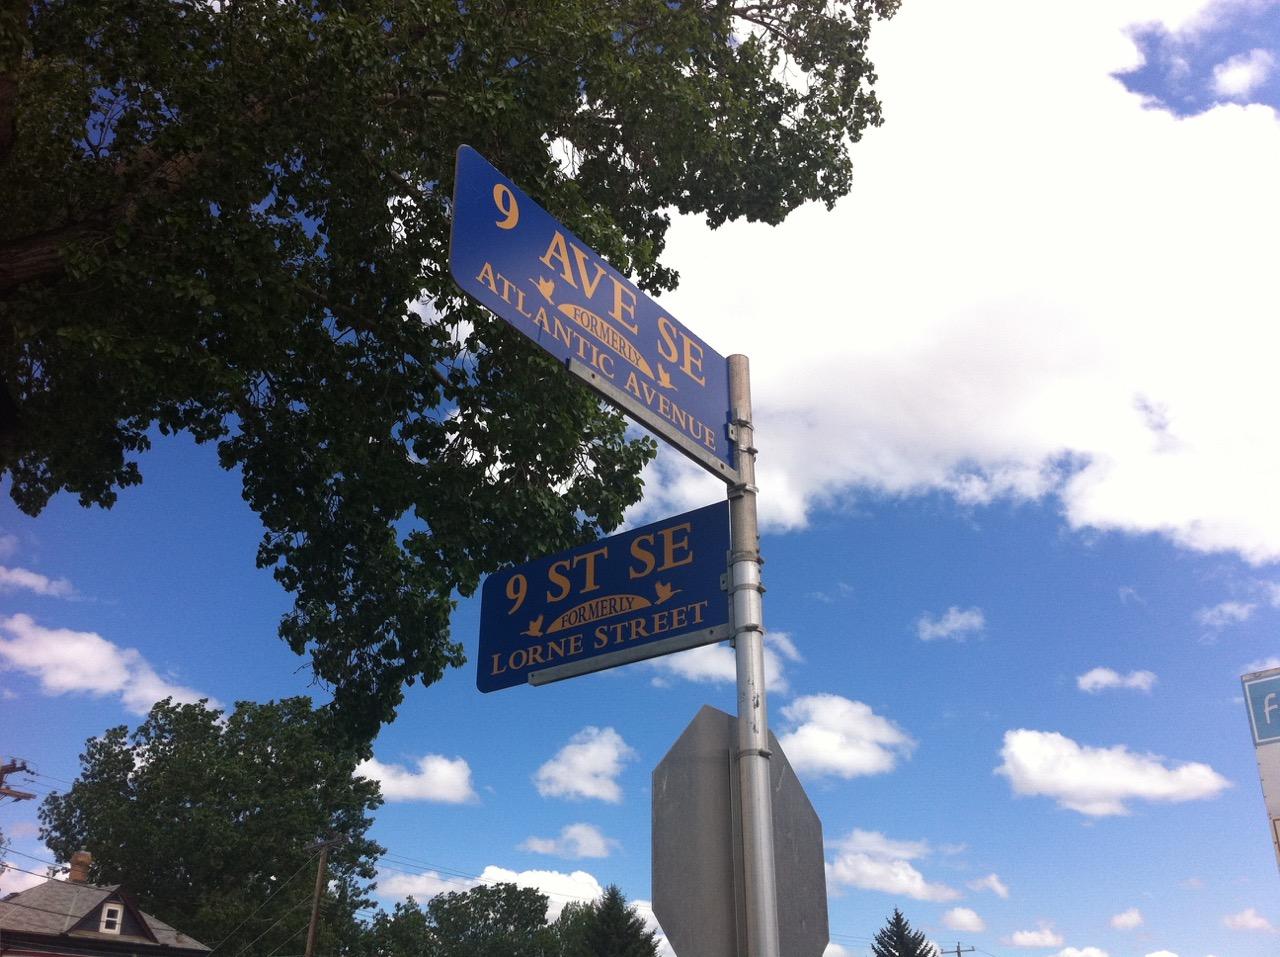 Corner of Atlantic Ave and Lorne St. Calgary